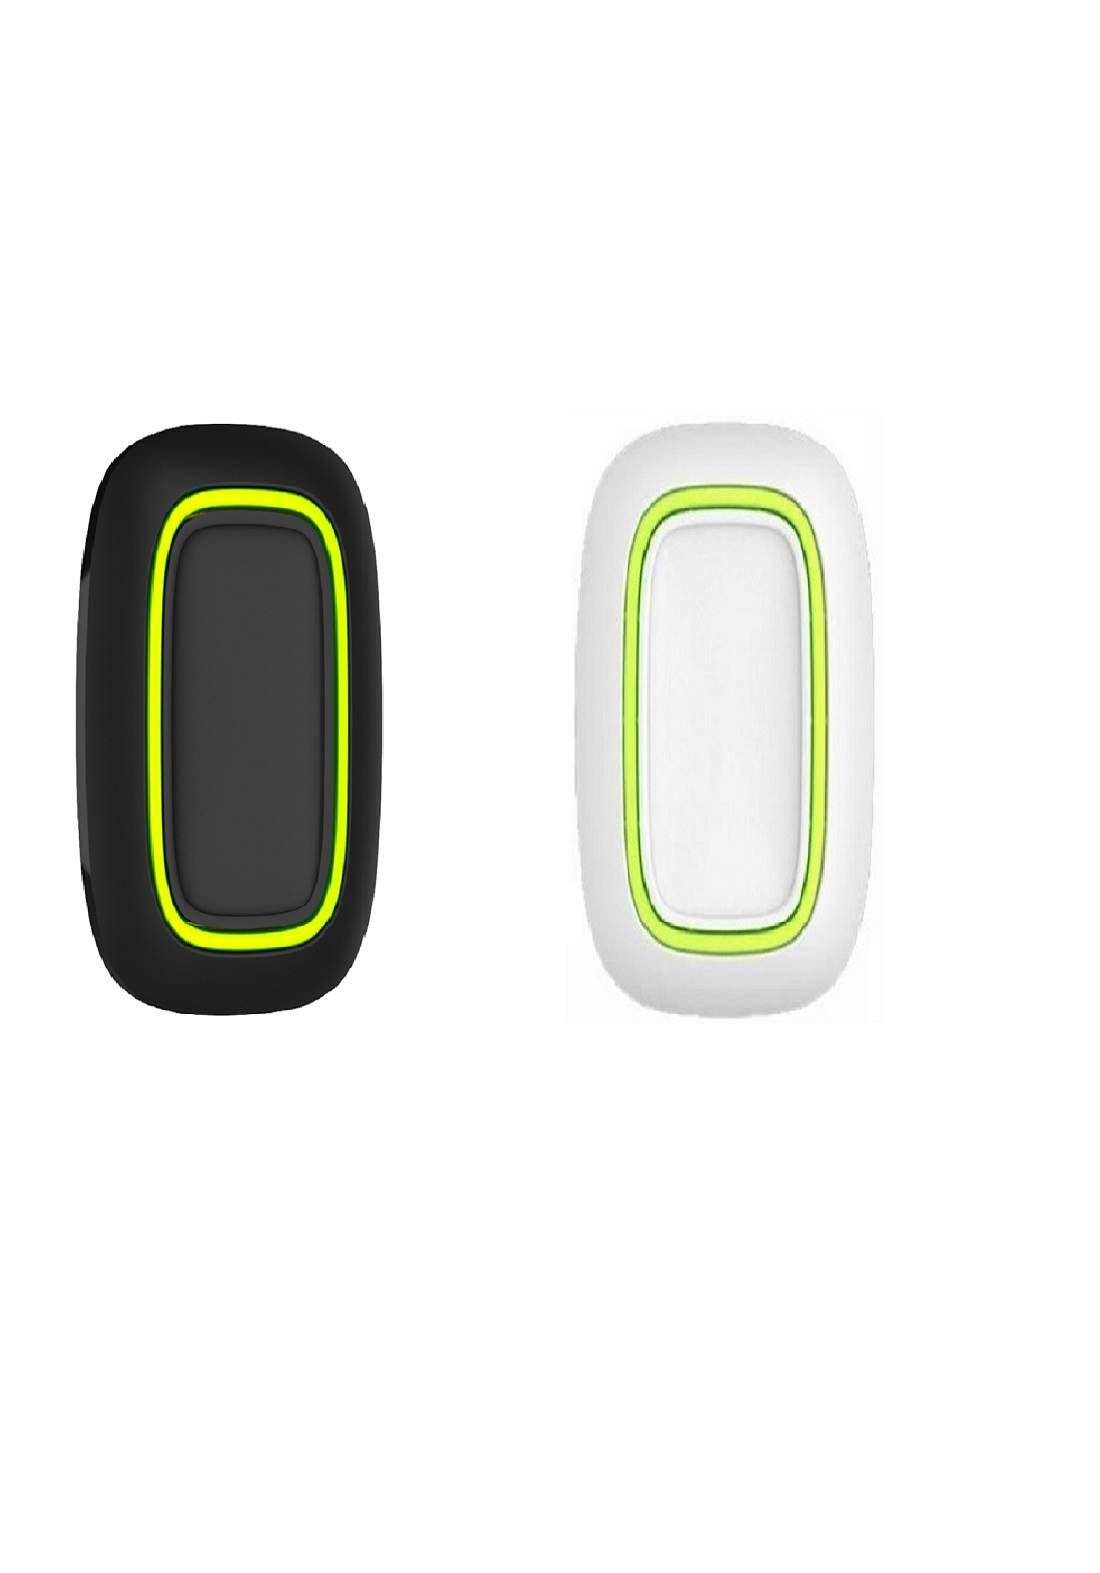 Ajax Button Wireless Panic Button & Remote Control for Ajax Alarm System زر التبليغ عن حالة طوارئ